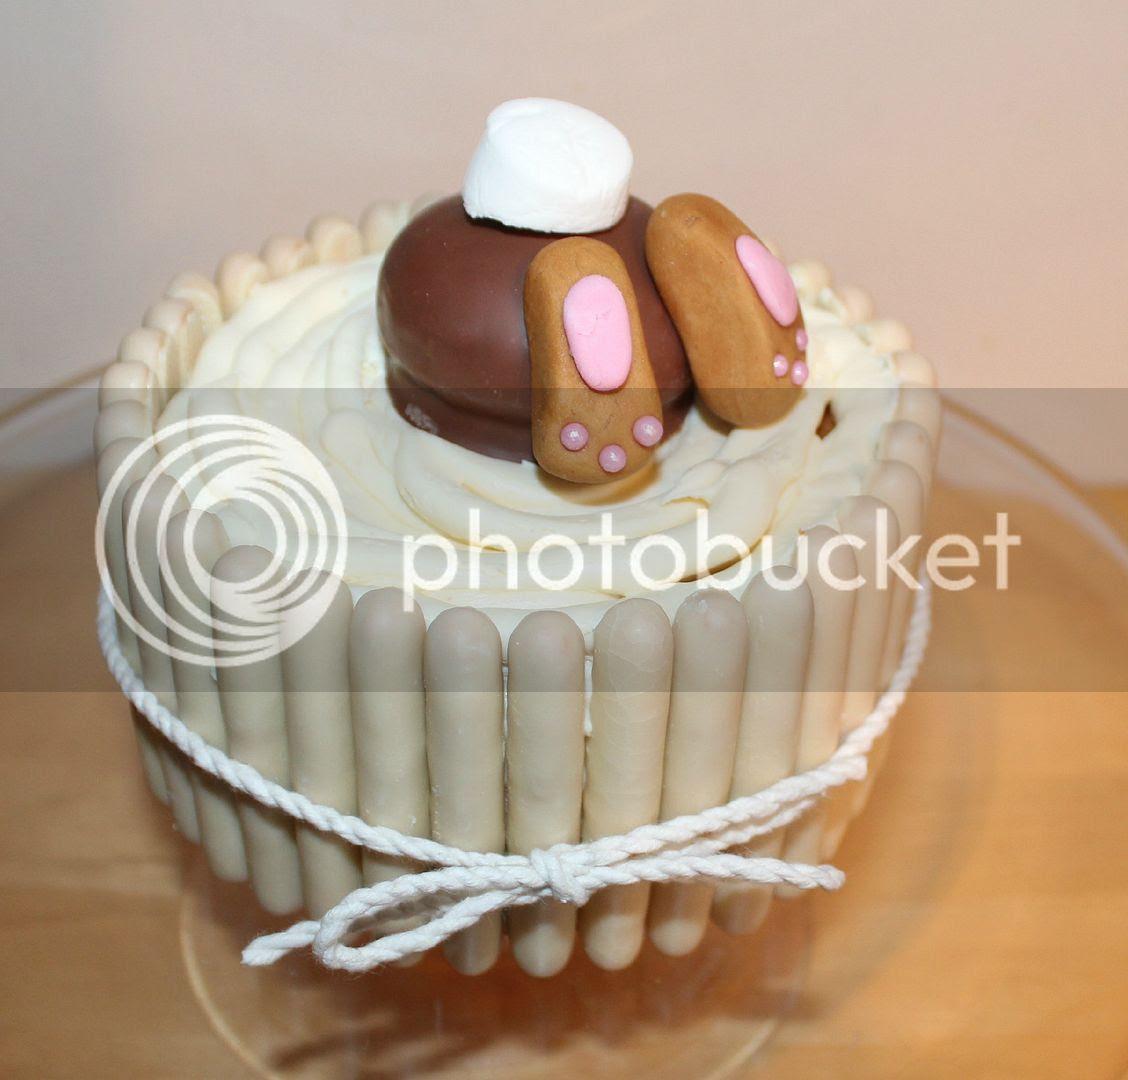 bunny butt in cake